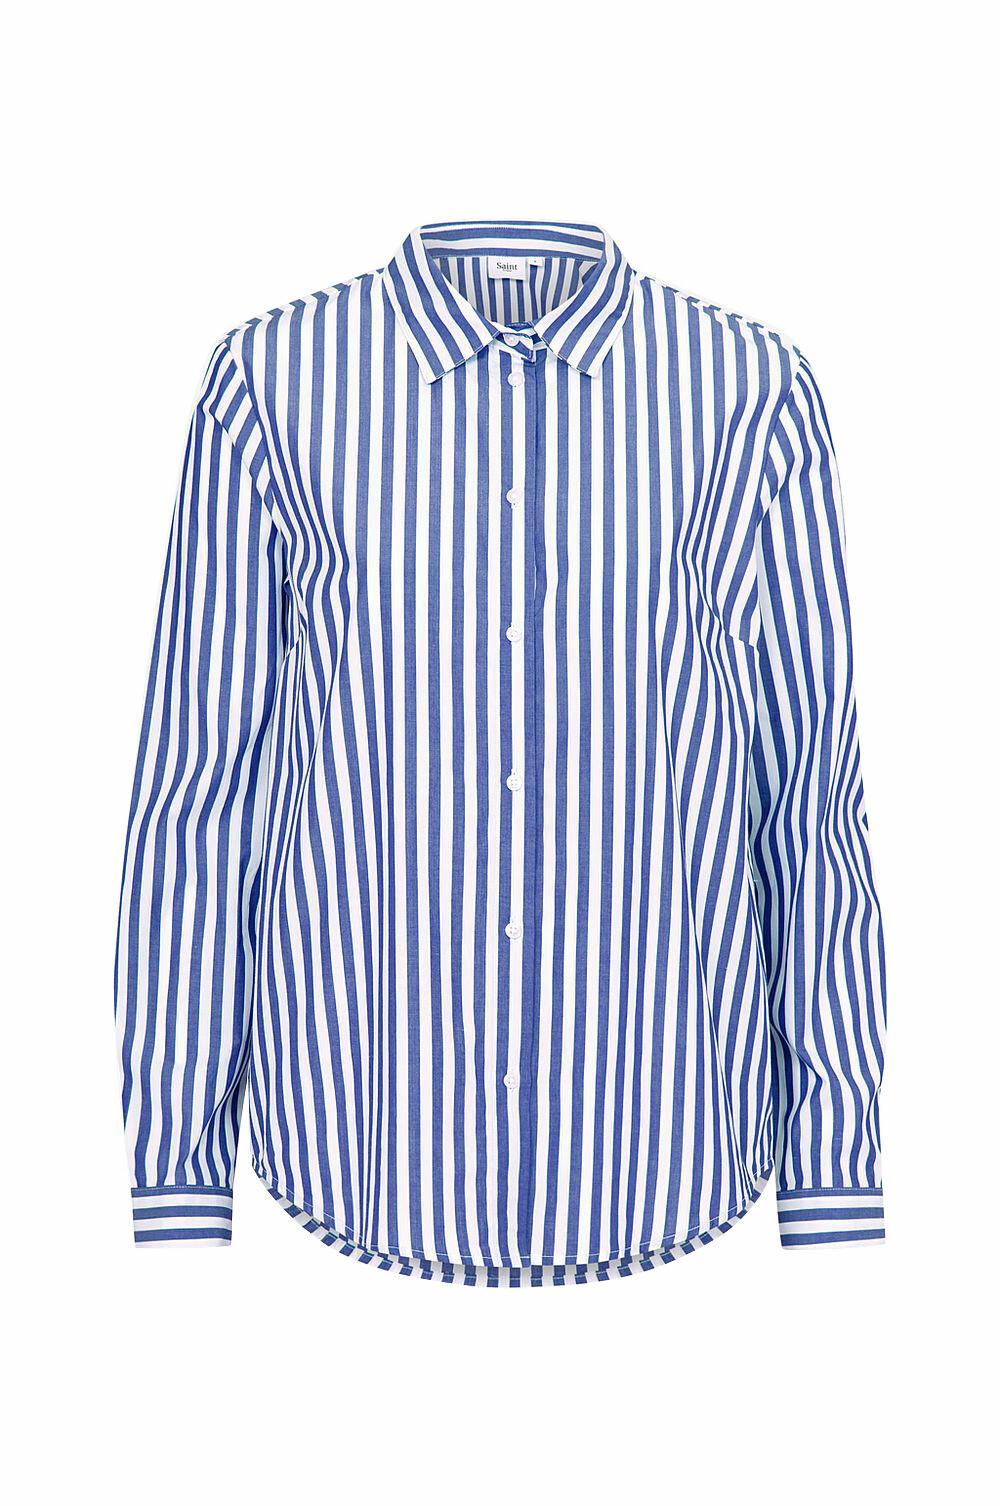 STILIGE STRIPER: Skjorte fra Saint Tropez, Ellos, kr 349.